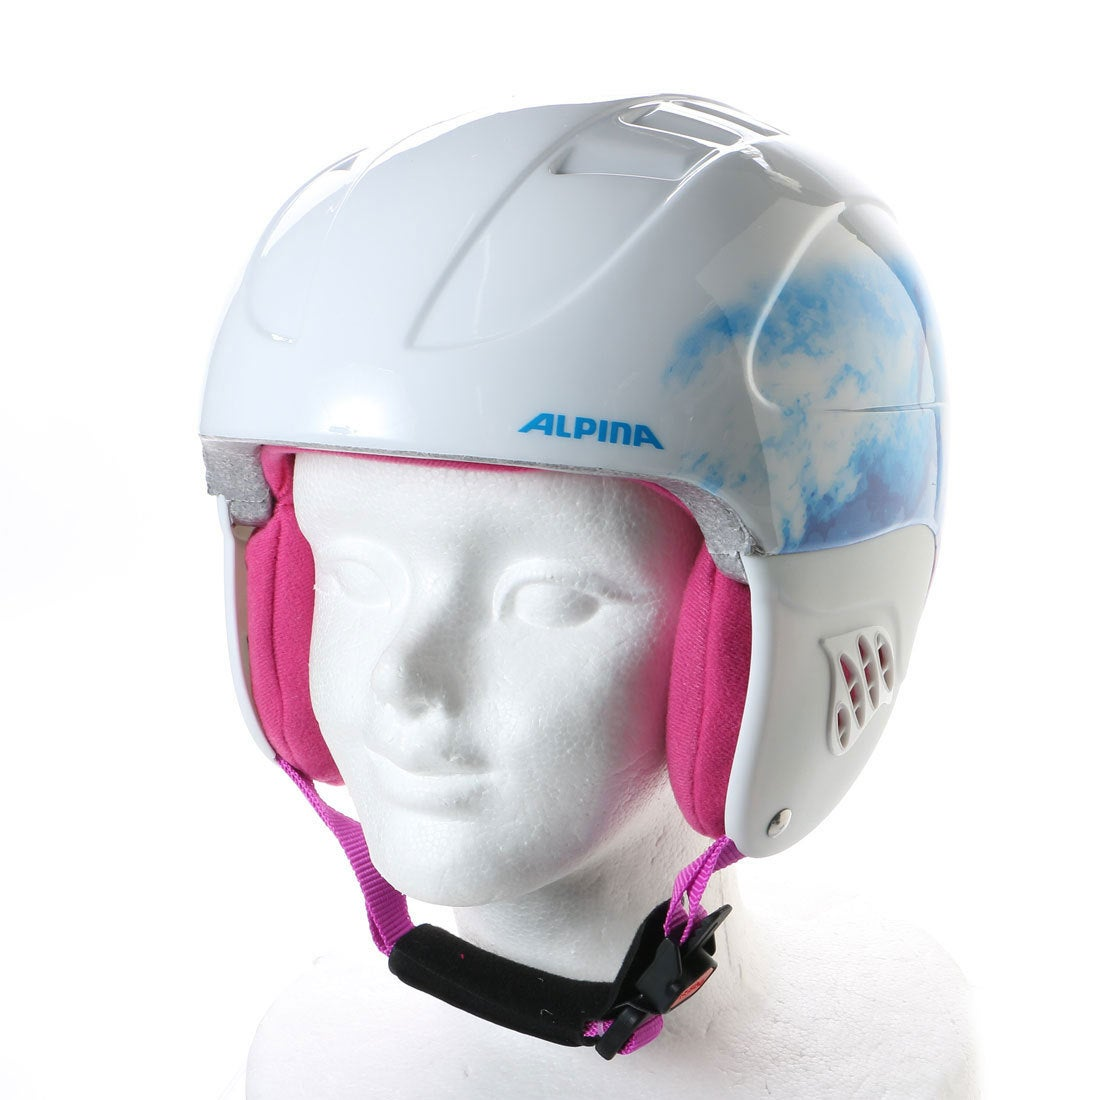 【SALE 20%OFF】ウベックス UVEX ジュニア スキー/スノーボード ヘルメット CARATPW209 209